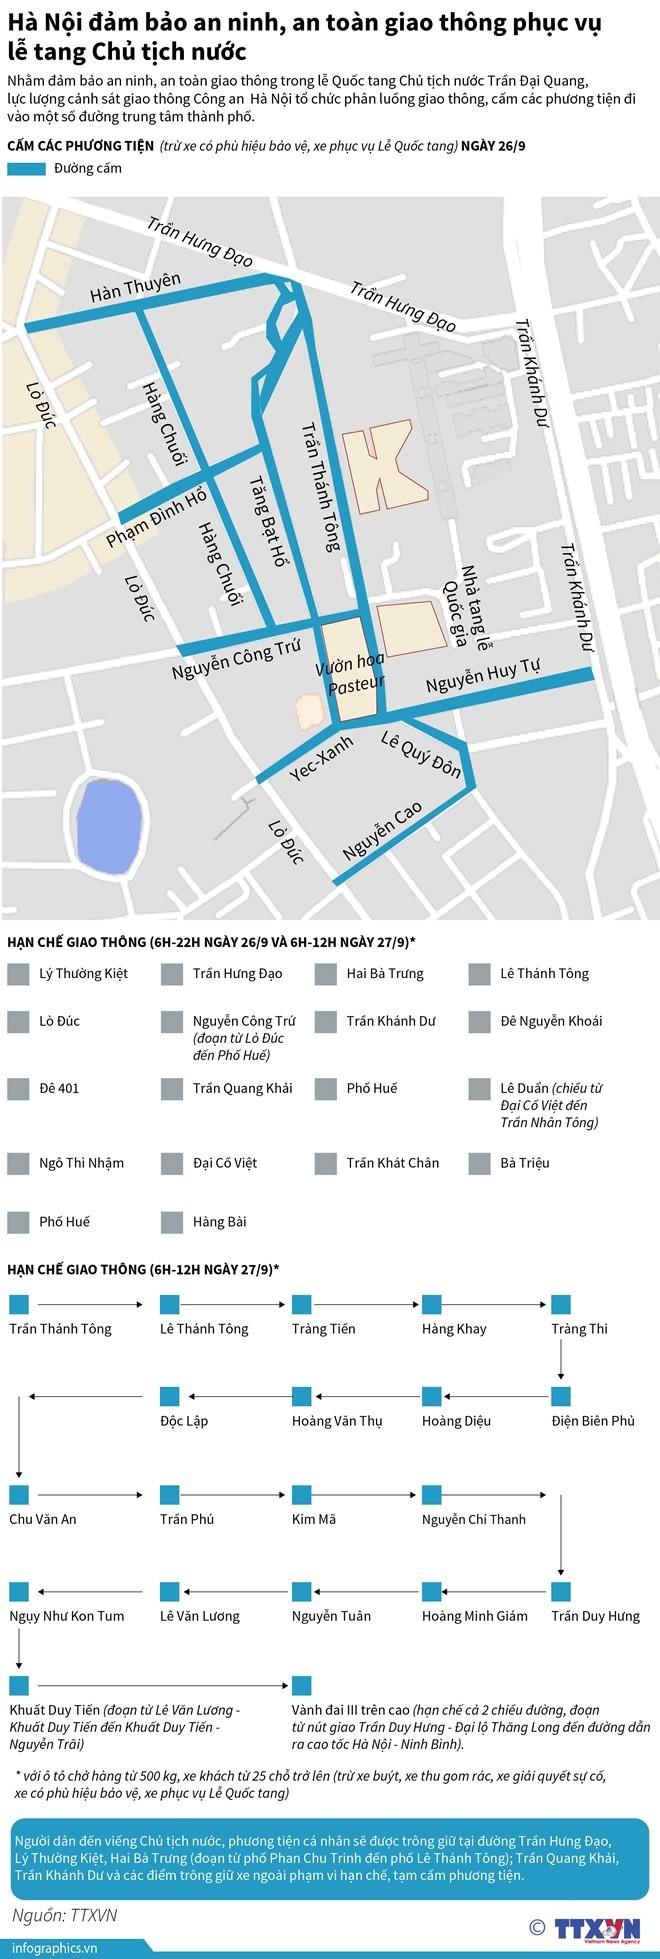 [Infographics] Ha Noi phan luong giao thong phuc vu le Quoc tang